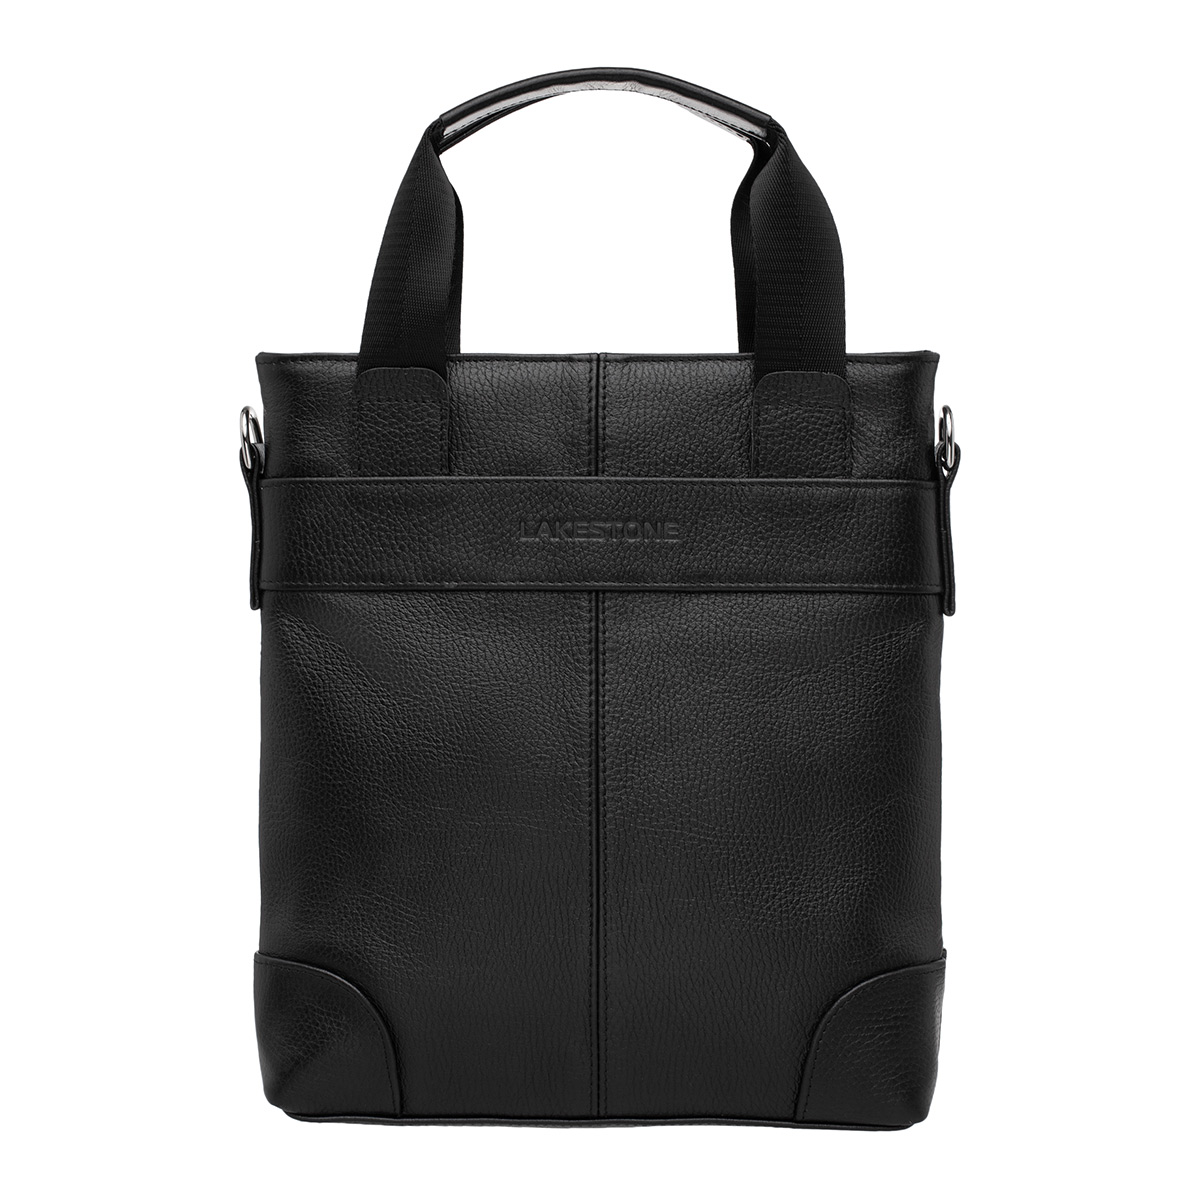 Мужская деловая сумка вертикальная Russell Black